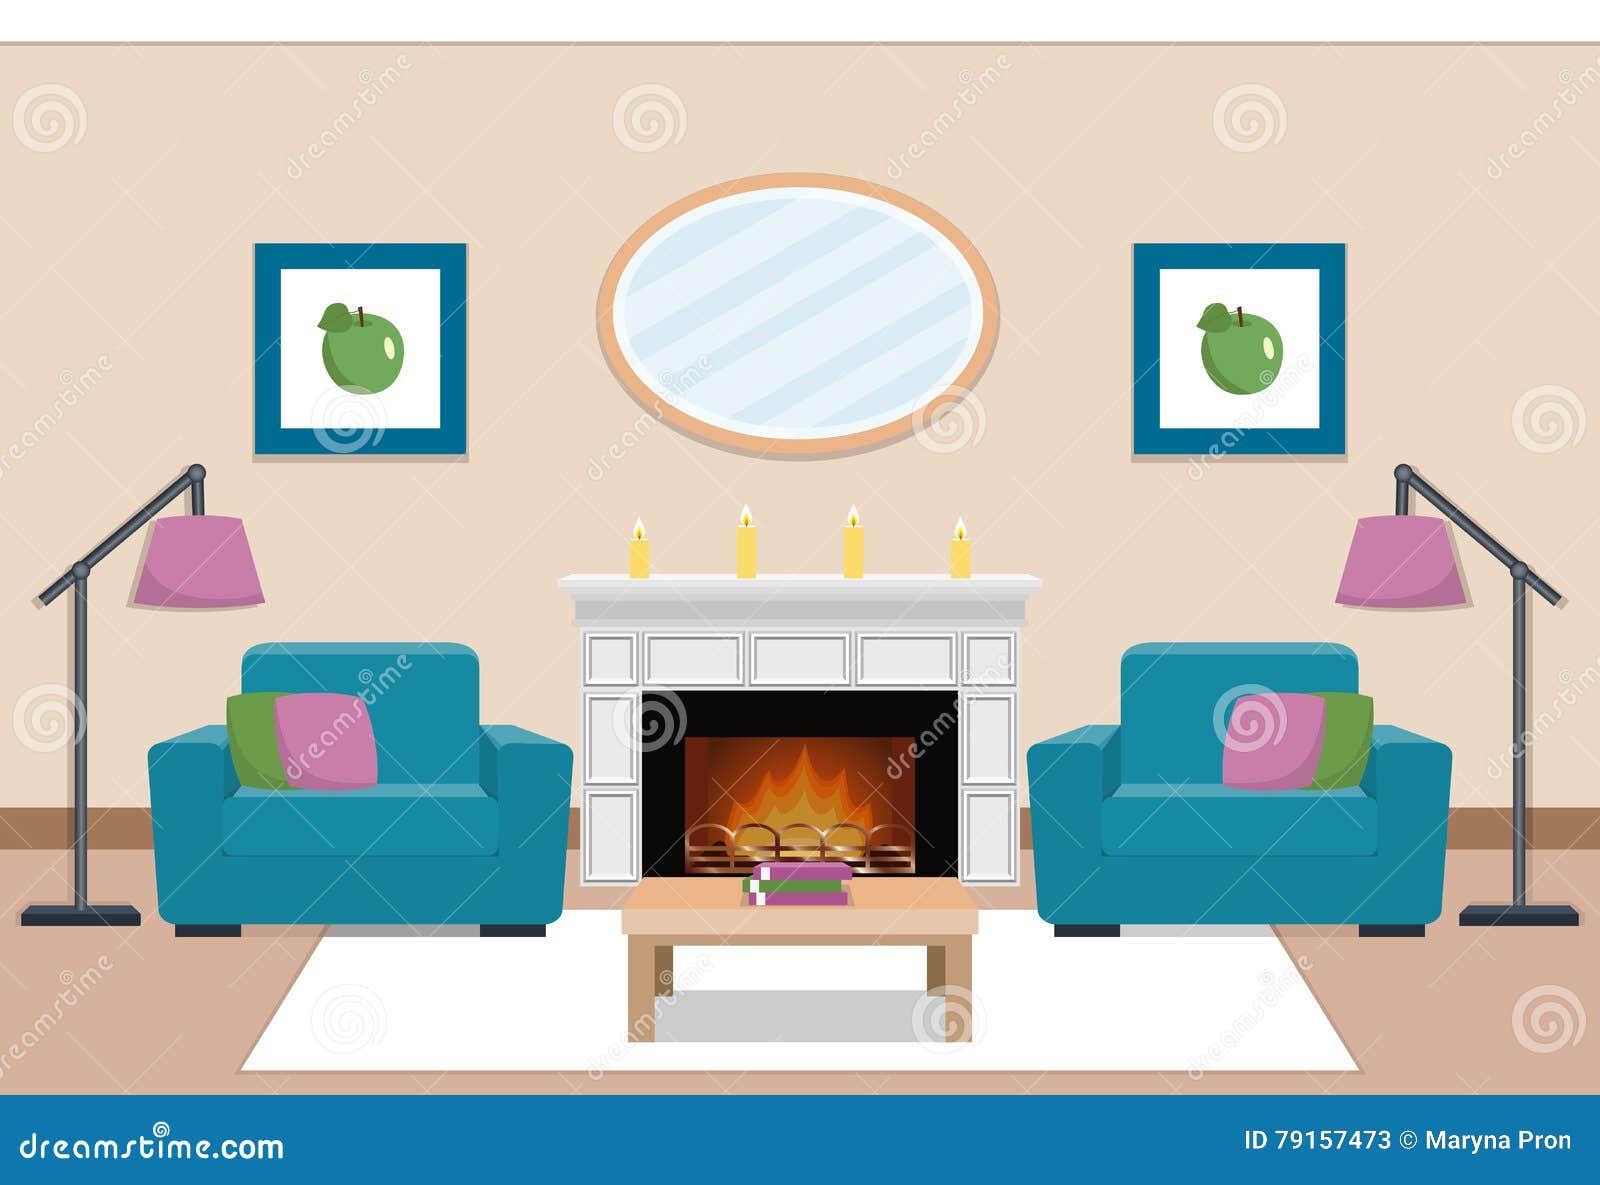 Living Room Interior With Chimney. Vector Illustration. Stock Vector ...